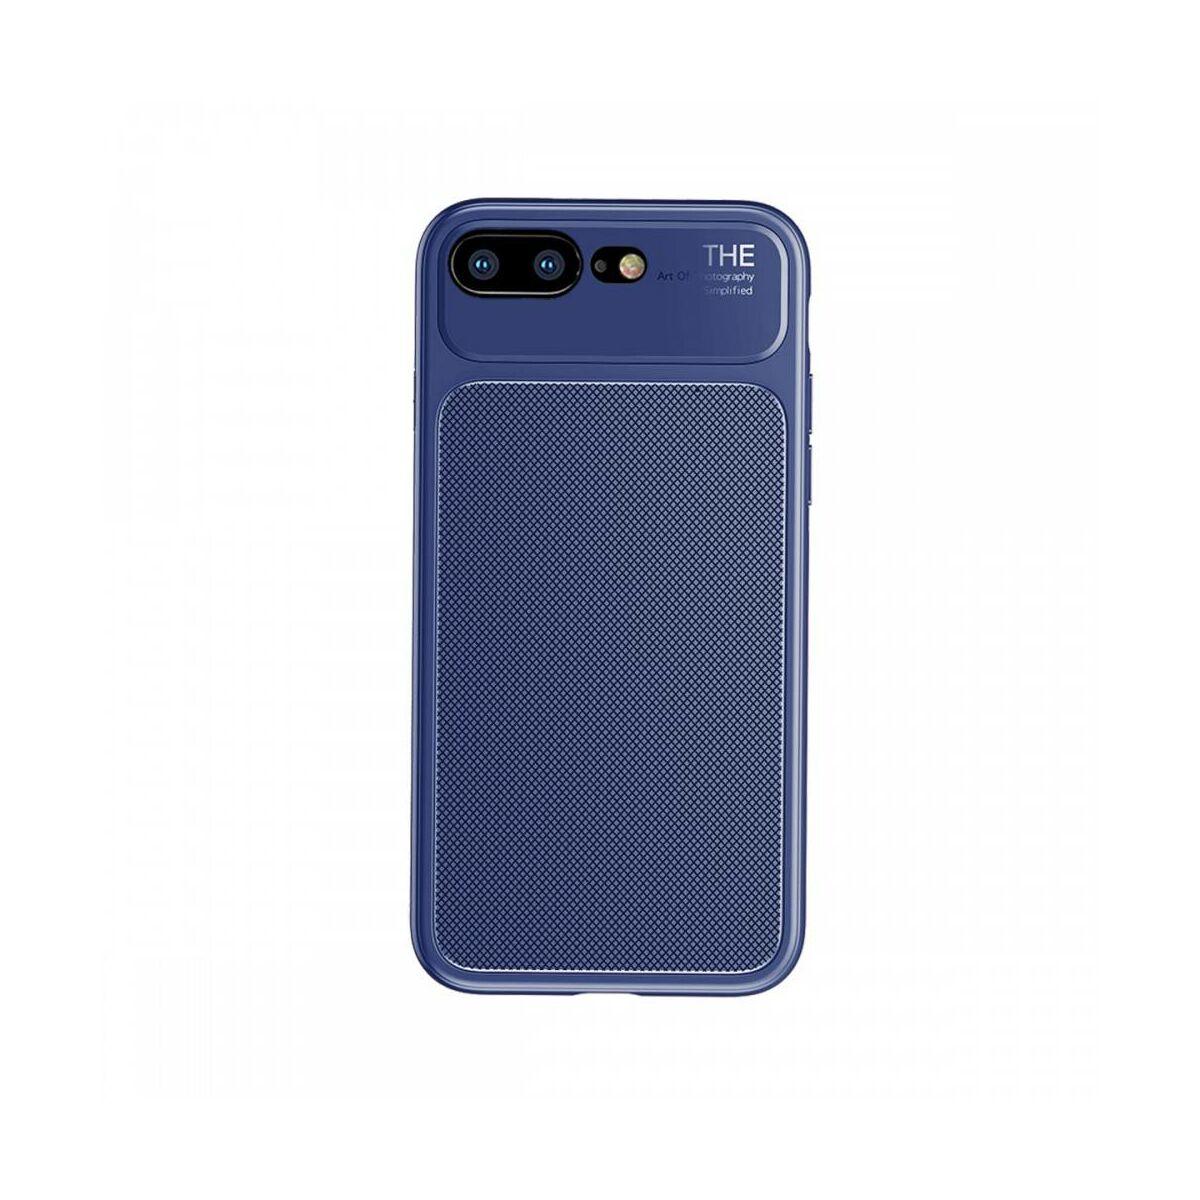 Baseus iPhone 8/7 Plus tok, Knight, kék (WIAPIPH8P-JU03)